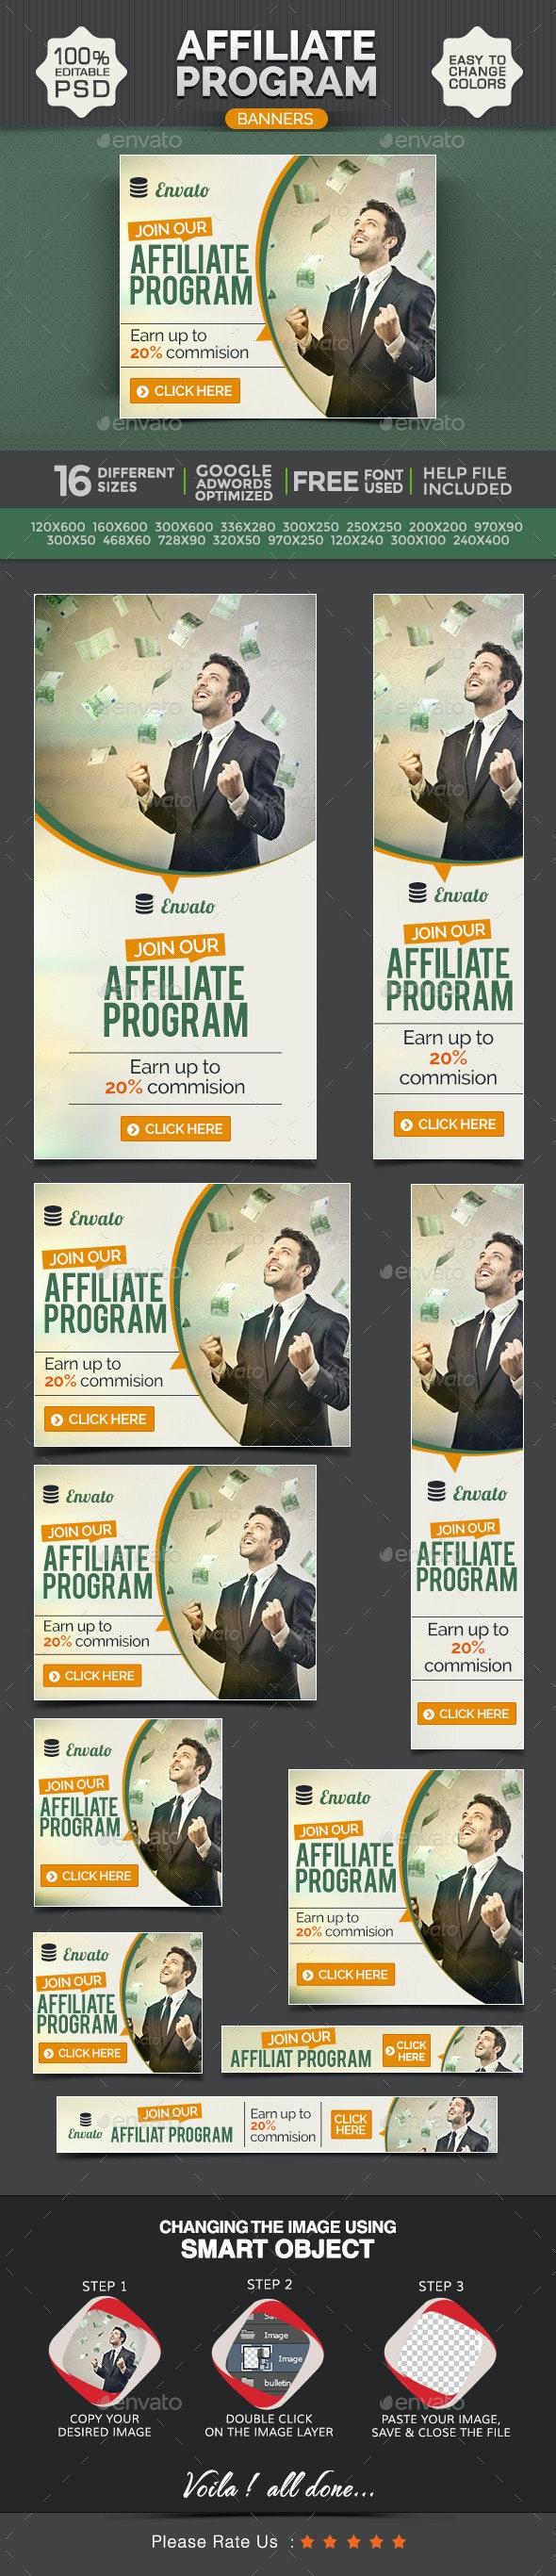 Affiliate Program Web Banner Design Set - Banners & Ads Web Elements